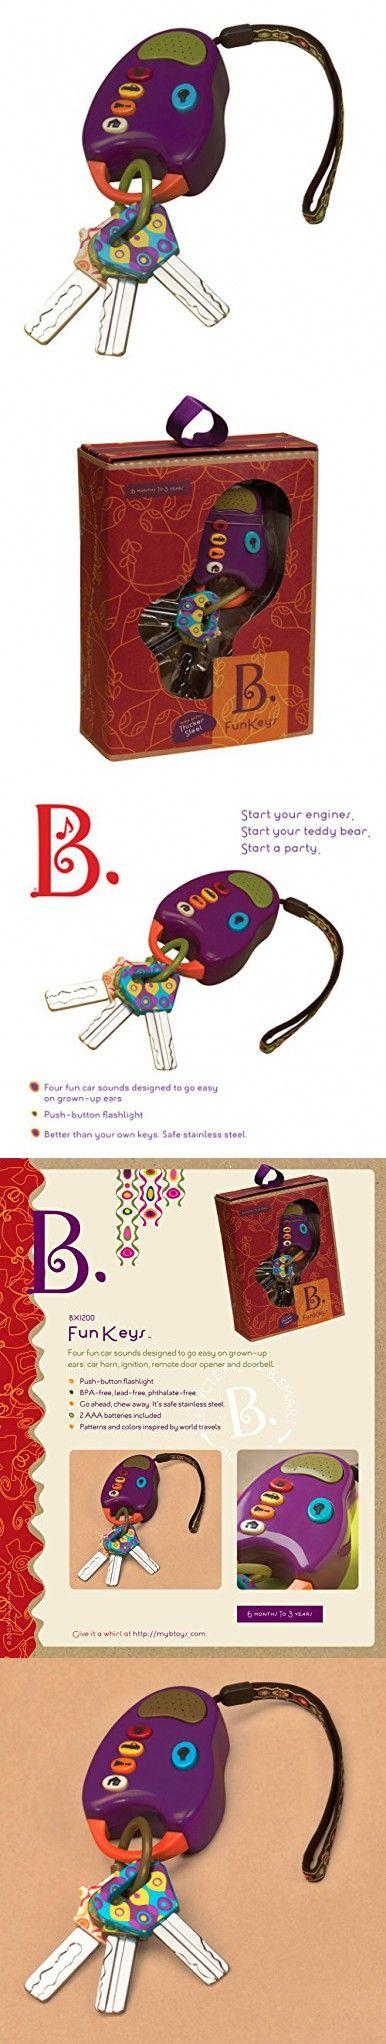 Baby & Toddler Toys B Funkeys Lights & Sounds Toy Keys for